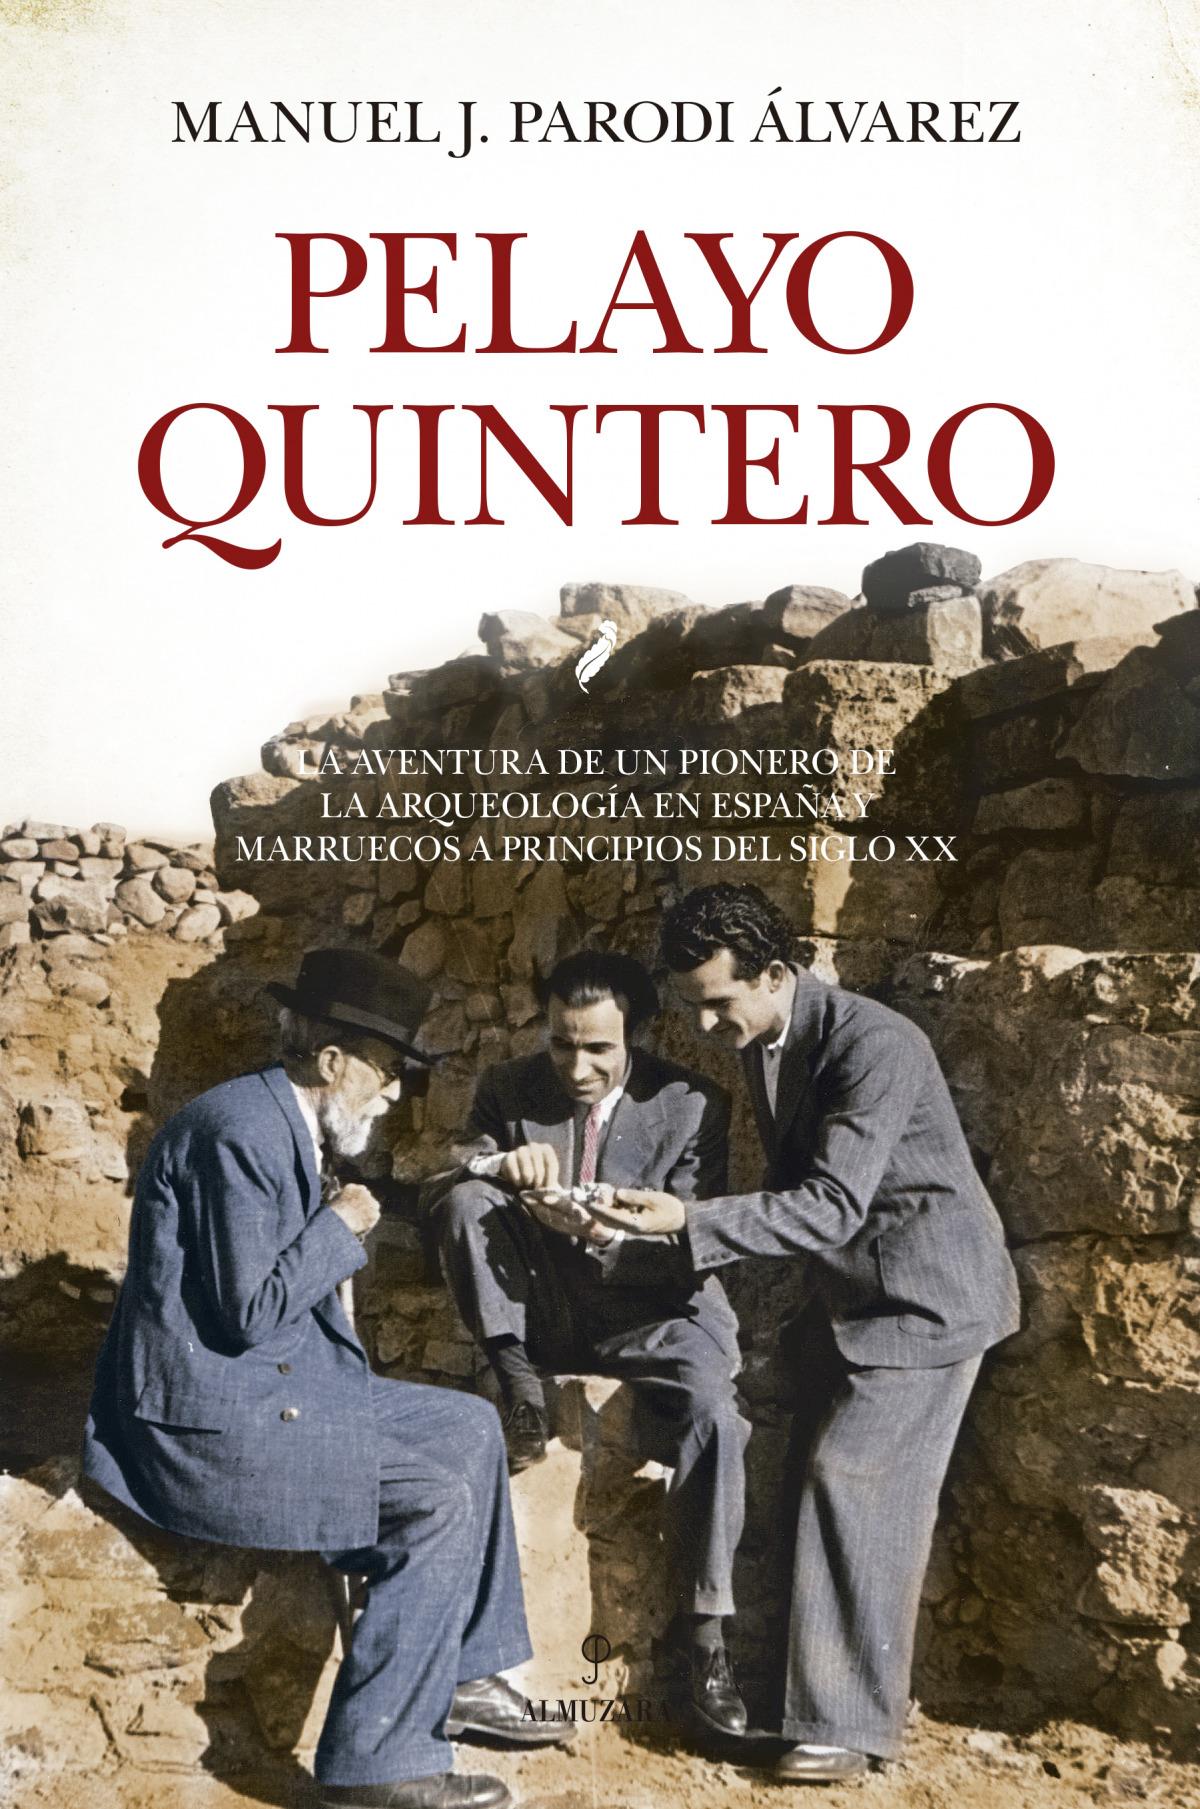 Pelayo Quintero